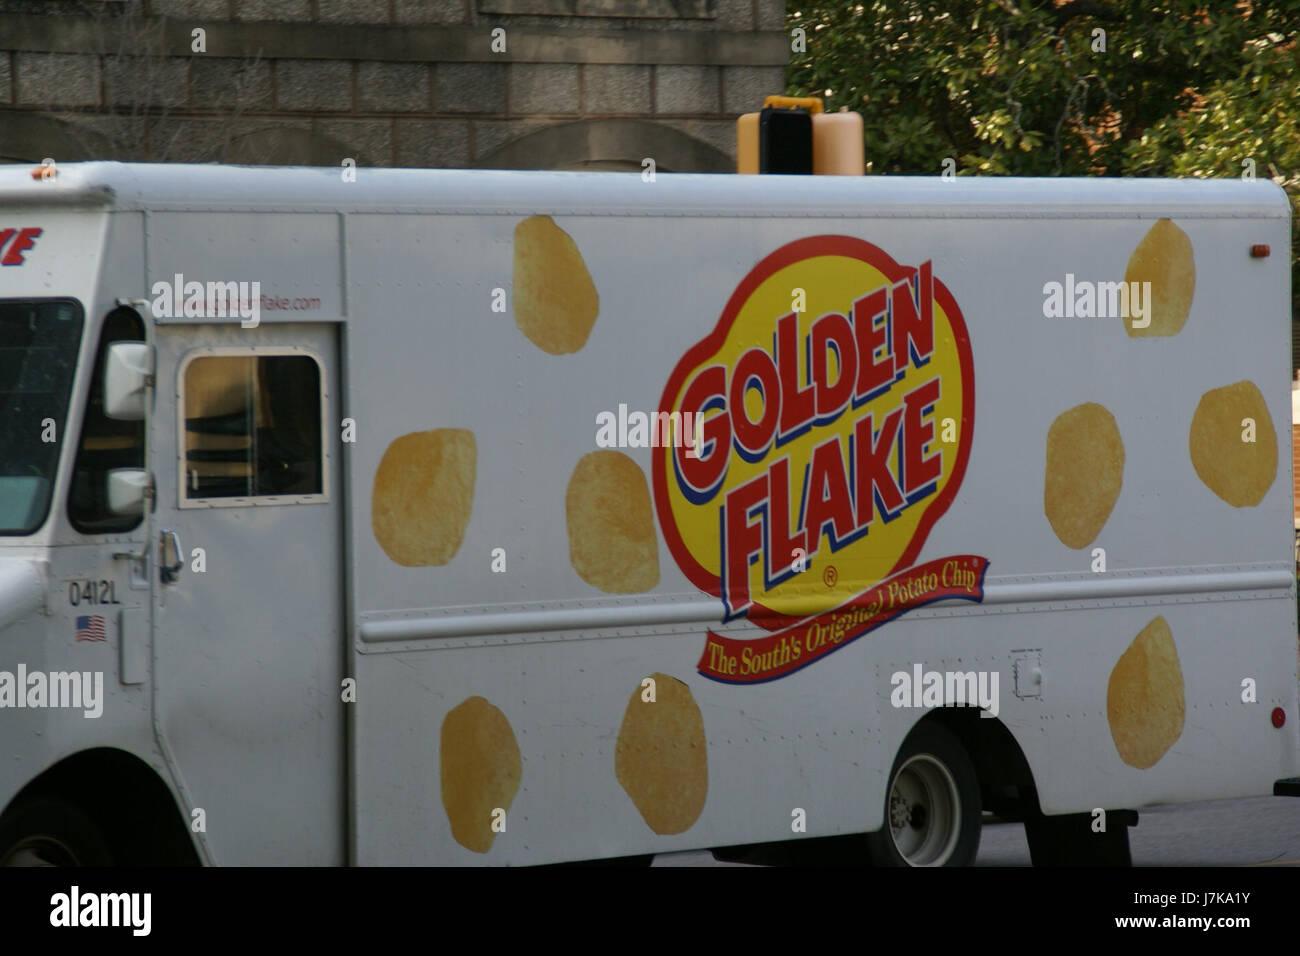 2011.02.18.171004 Lieferwagen Golden Flake Bainbridge Géorgie Banque D'Images